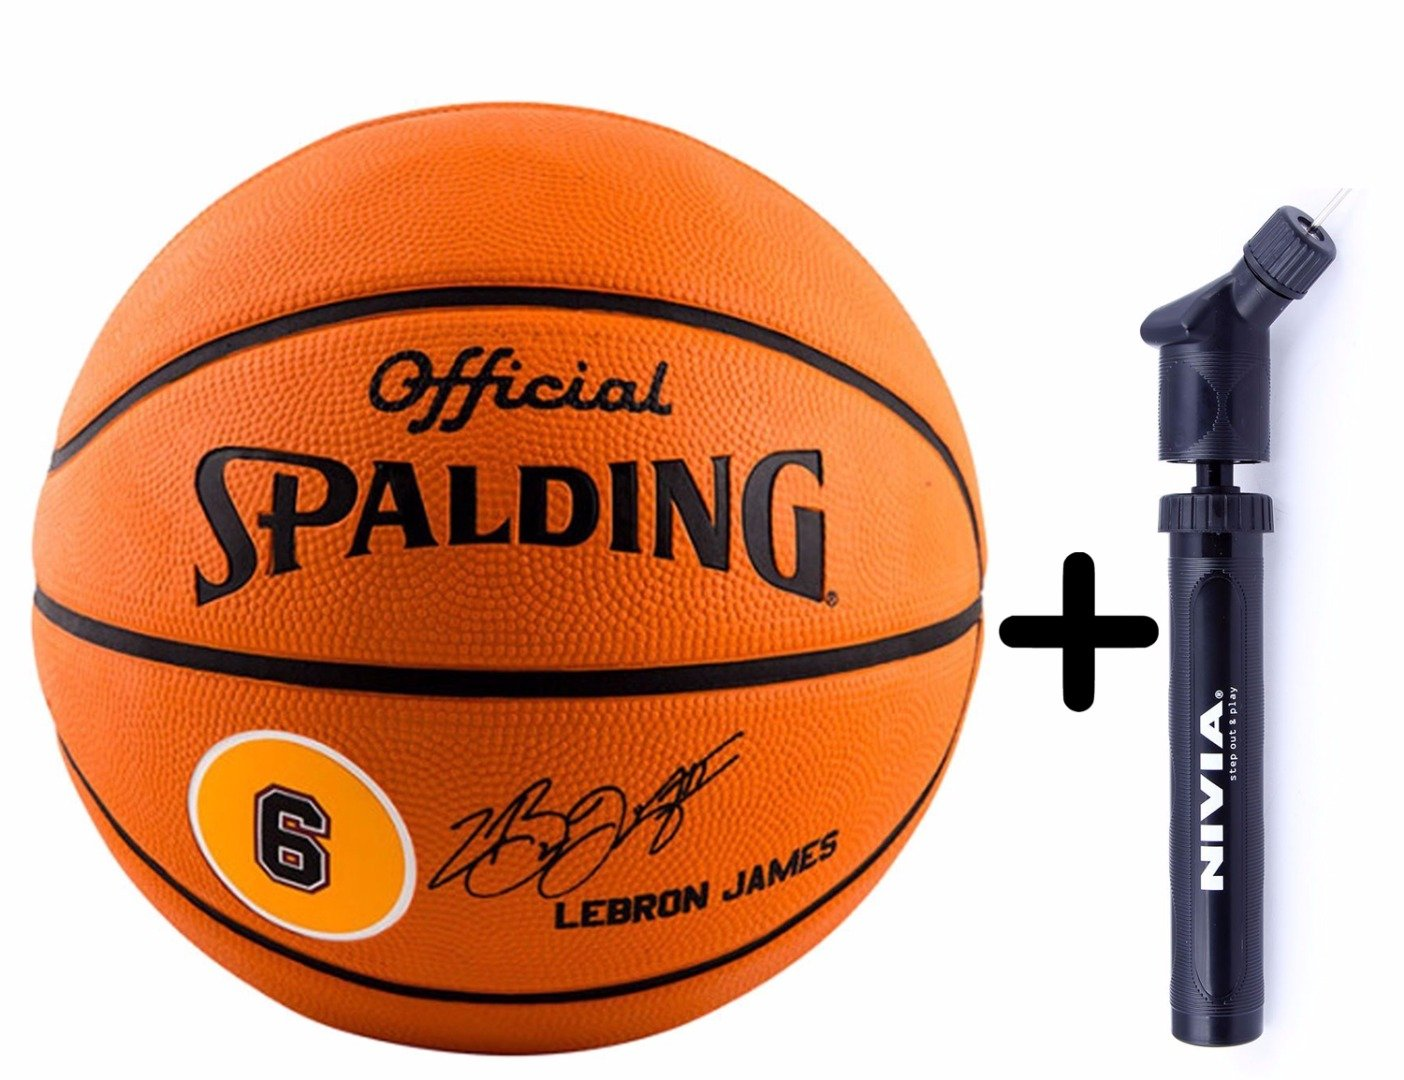 c420b5bb6c7fb Buy Spalding Basketball Lebron James Combo (Spalding Lebron James Basketball